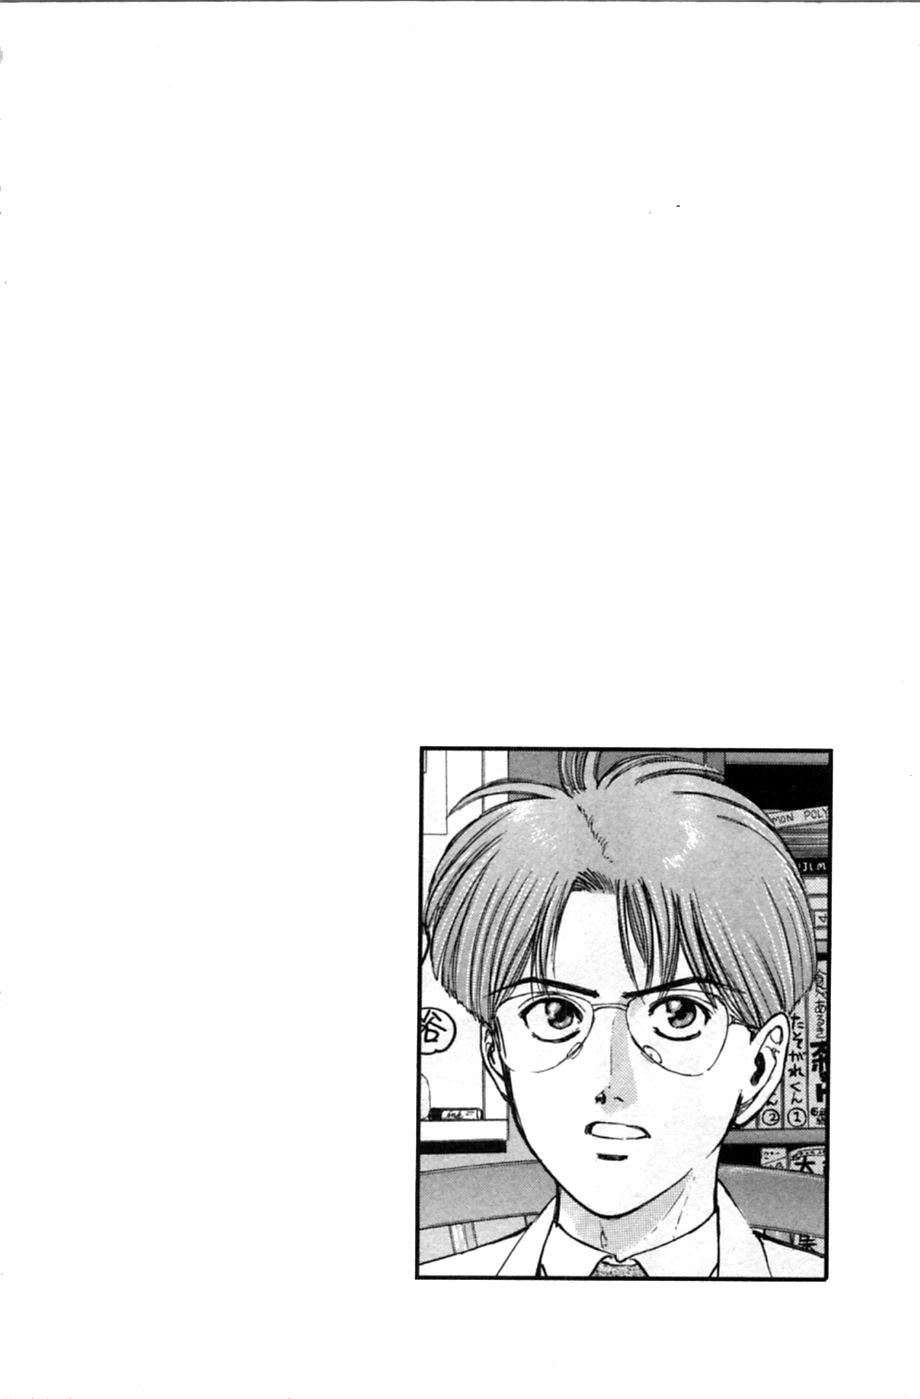 Psychometrer Eiji chapter 44 trang 23